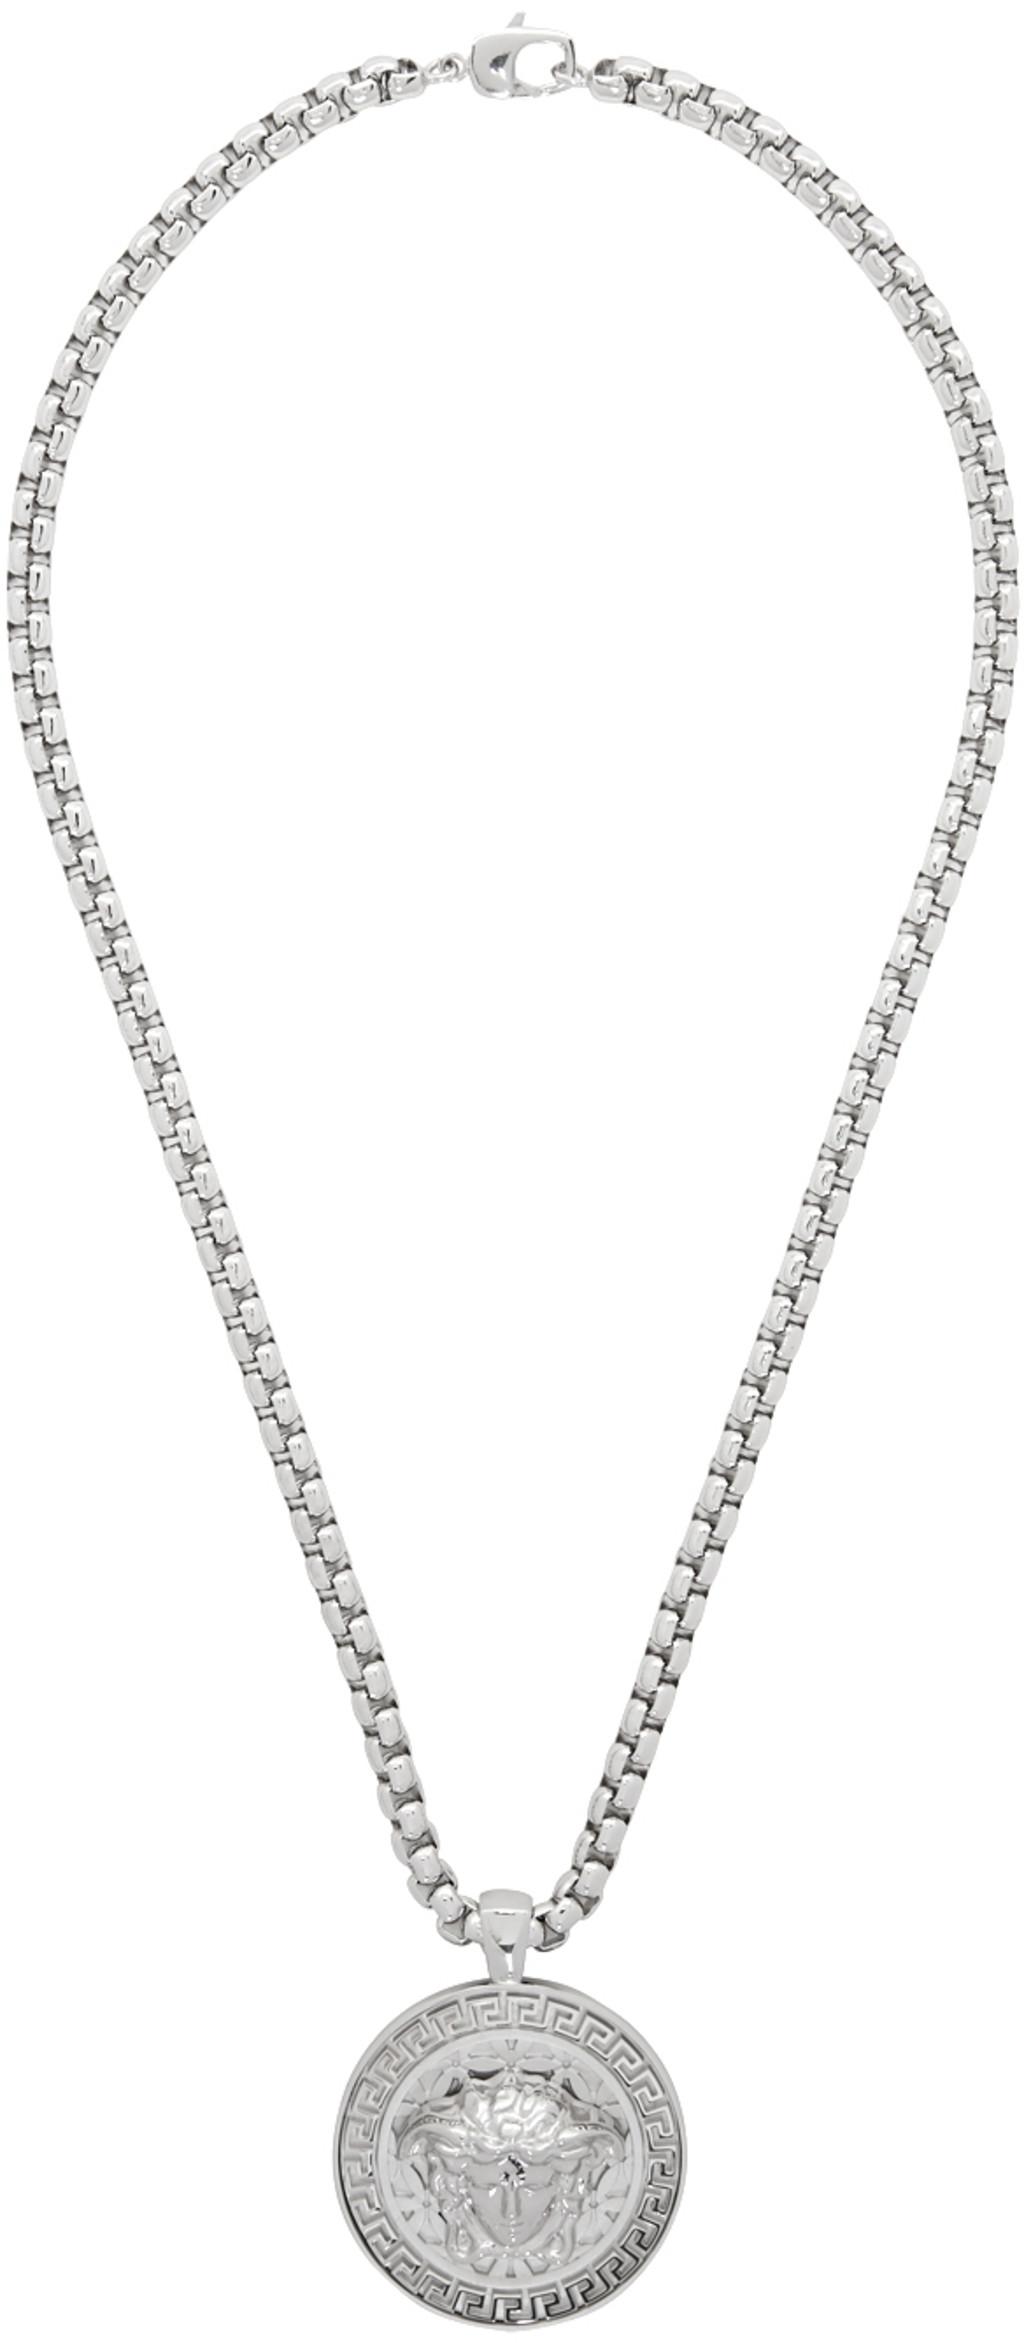 1f46a112c8 Silver Medusa Necklace